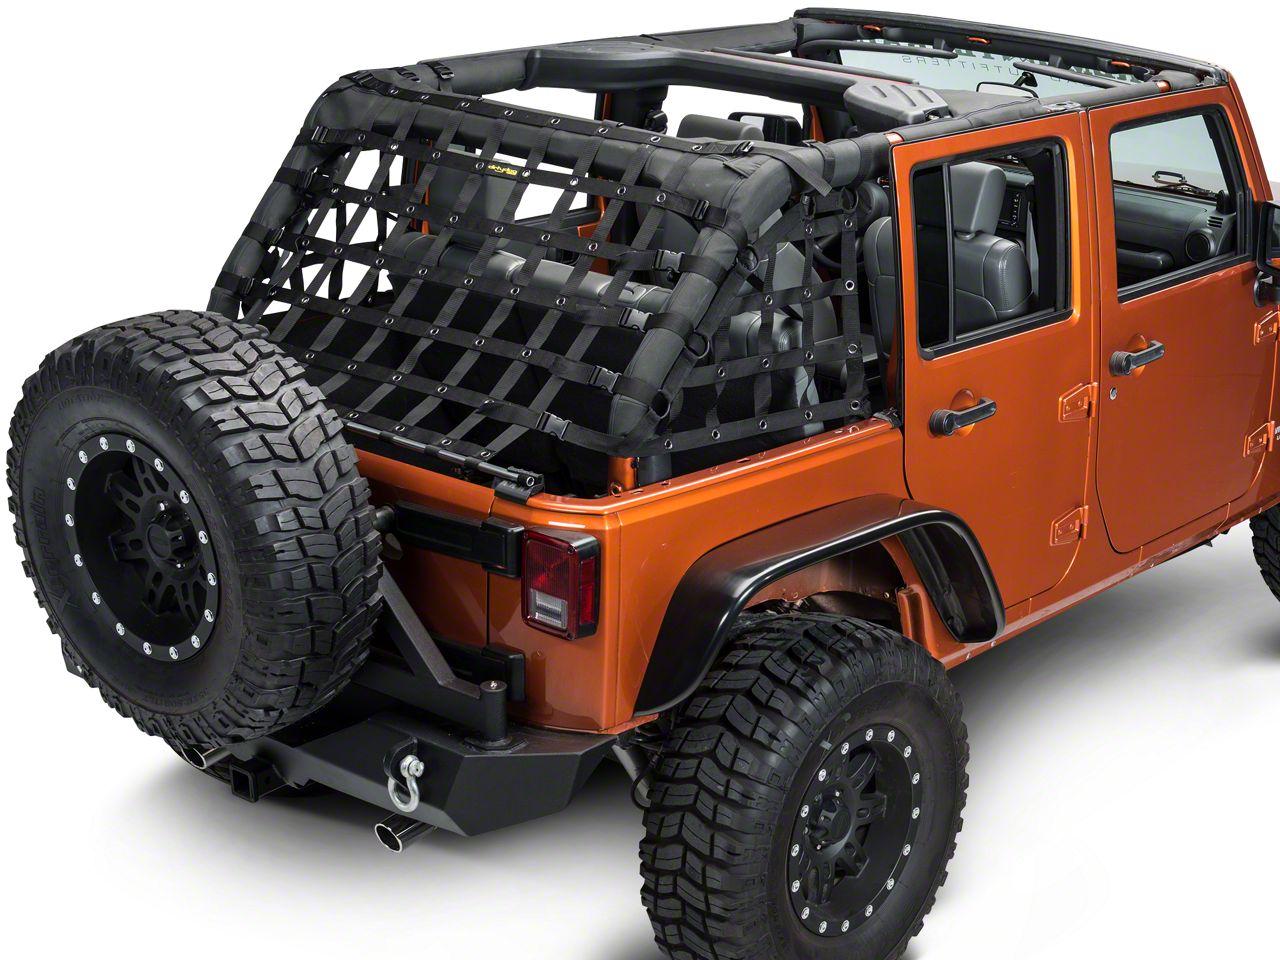 Dirty Dog 4x4 3-Piece Rear Netting Kit - Black (07-18 Jeep Wrangler JK 4 Door)